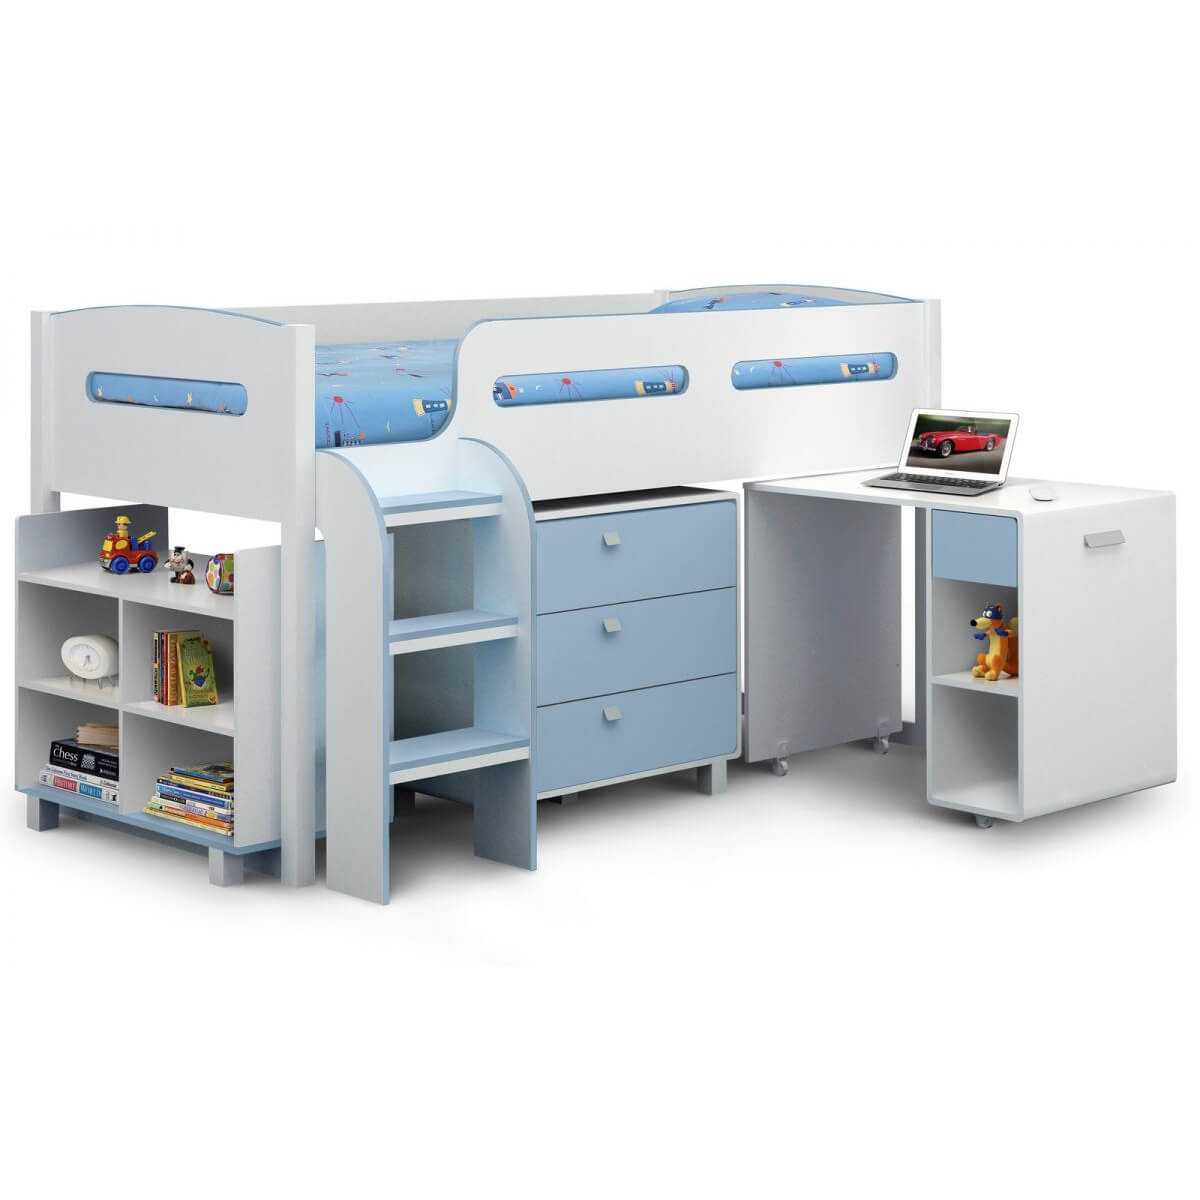 Kiddo Single Cabin Bed Sky Blue & White